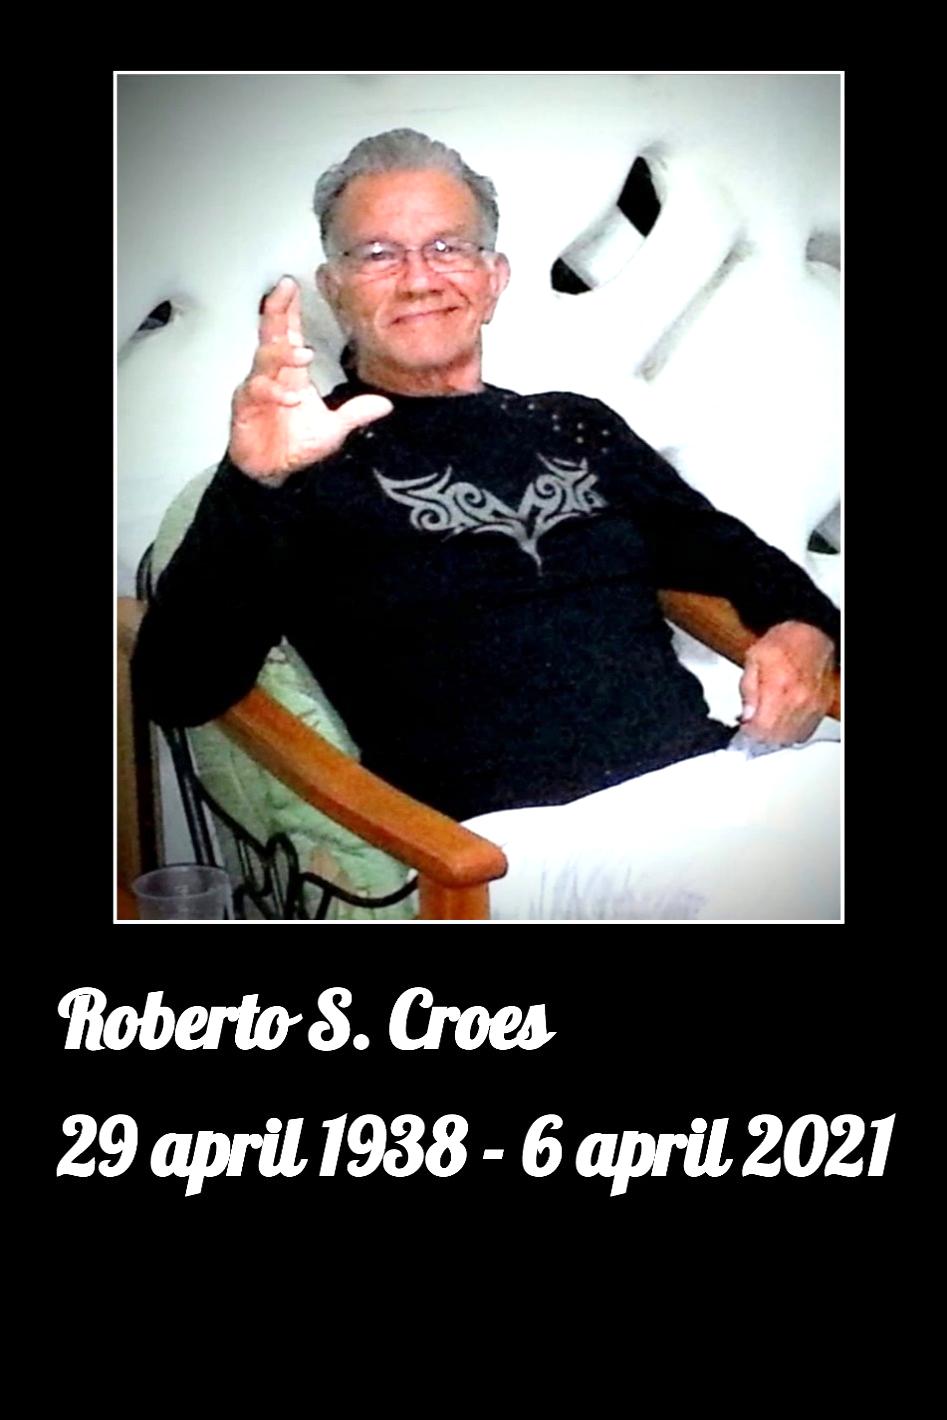 Roberto Simon Croes